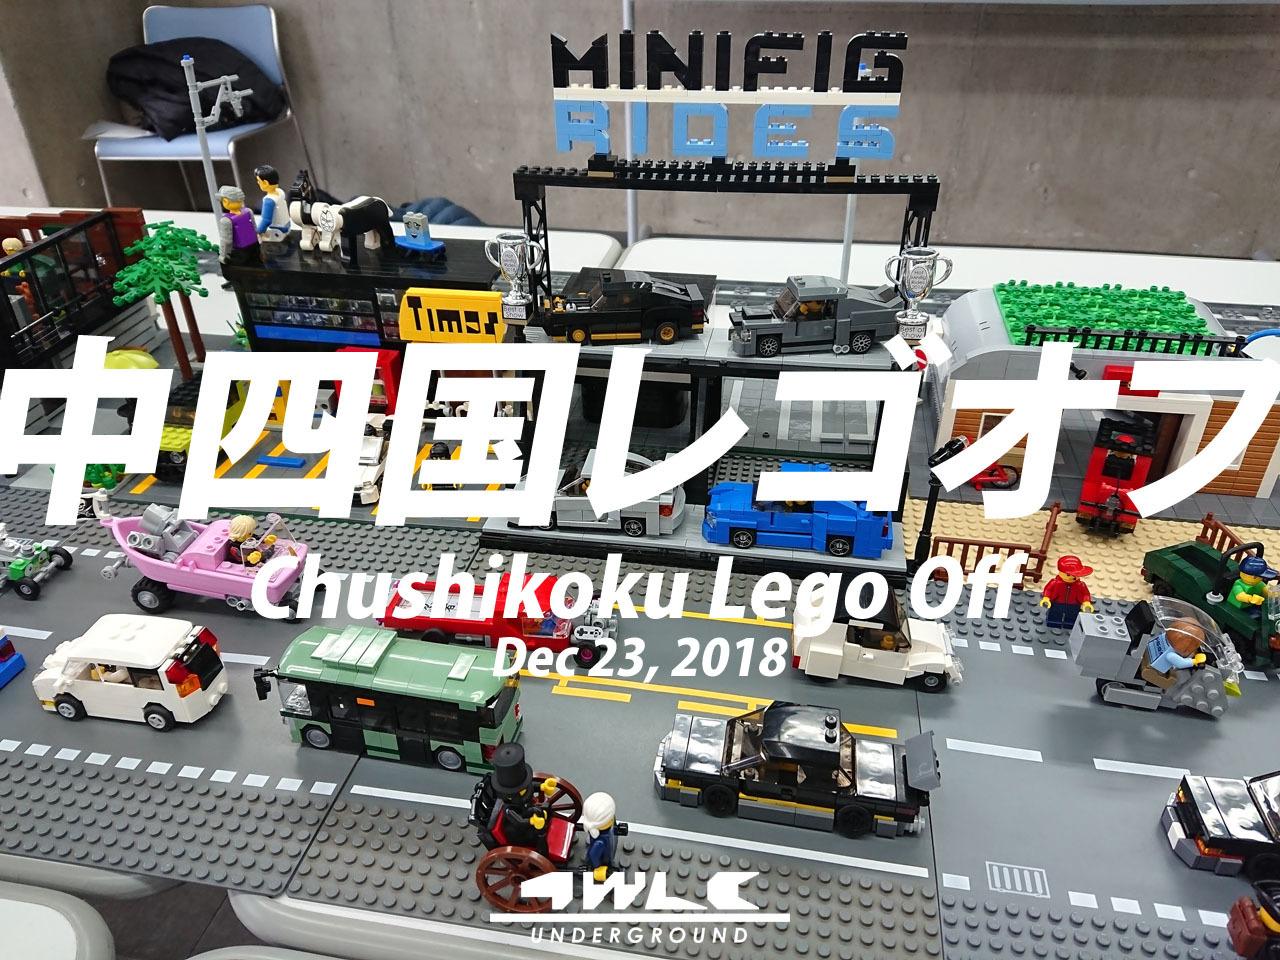 20181223_chusikoku_0.jpg